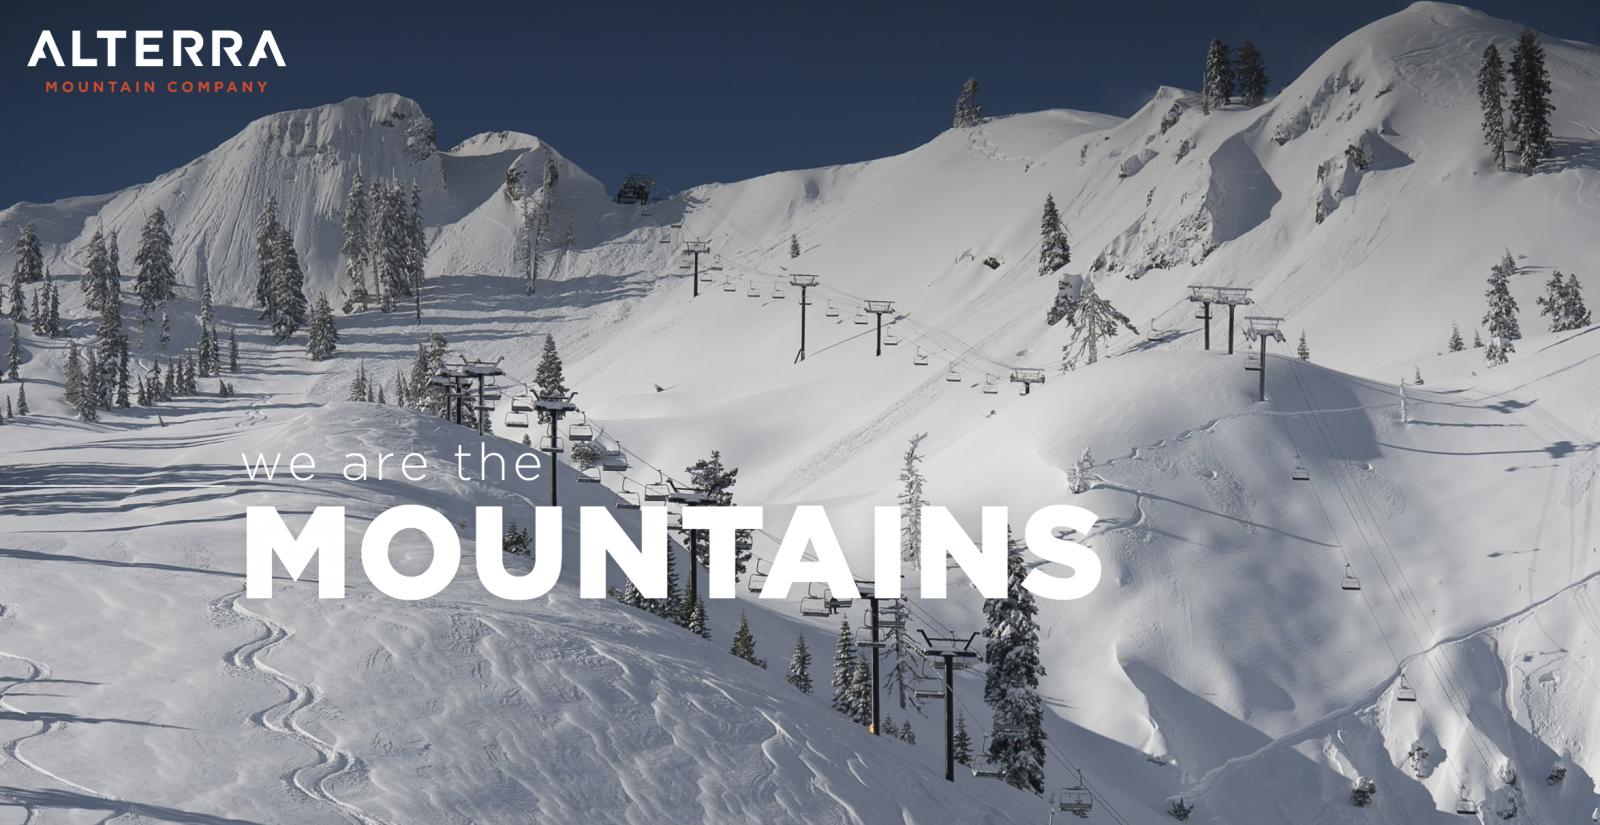 Alterra Mountain Company Logo with Mammoth Mountain in Winter Snow